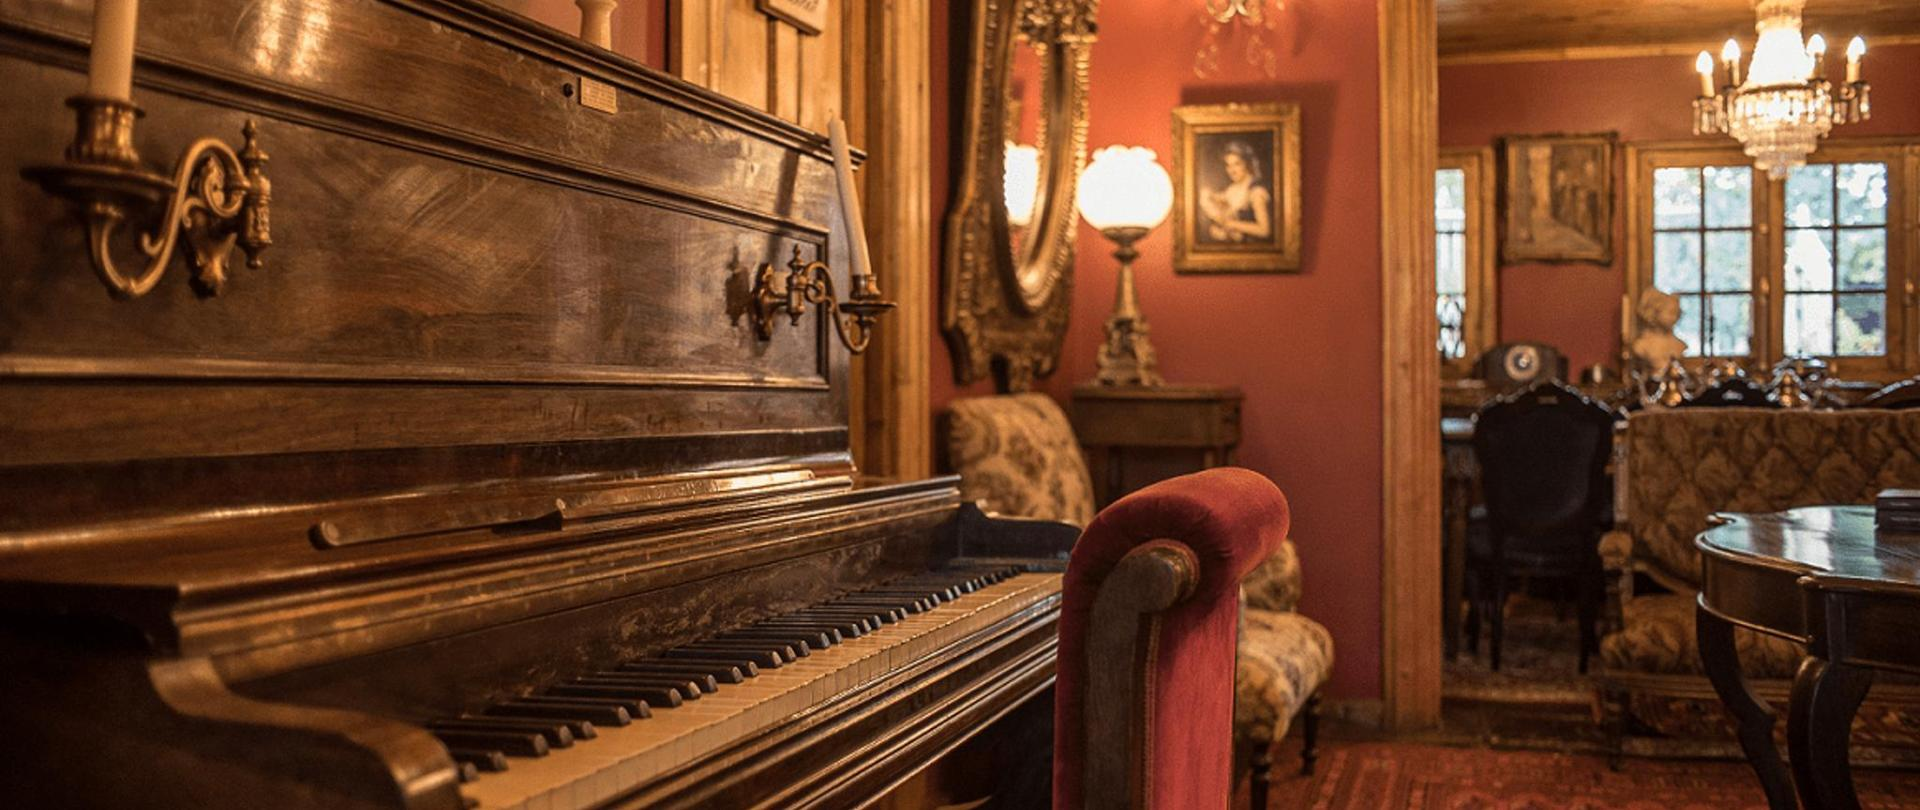 HOTEL BOUTIQUE VINTAGE SANTA CRUZ 06-min.png